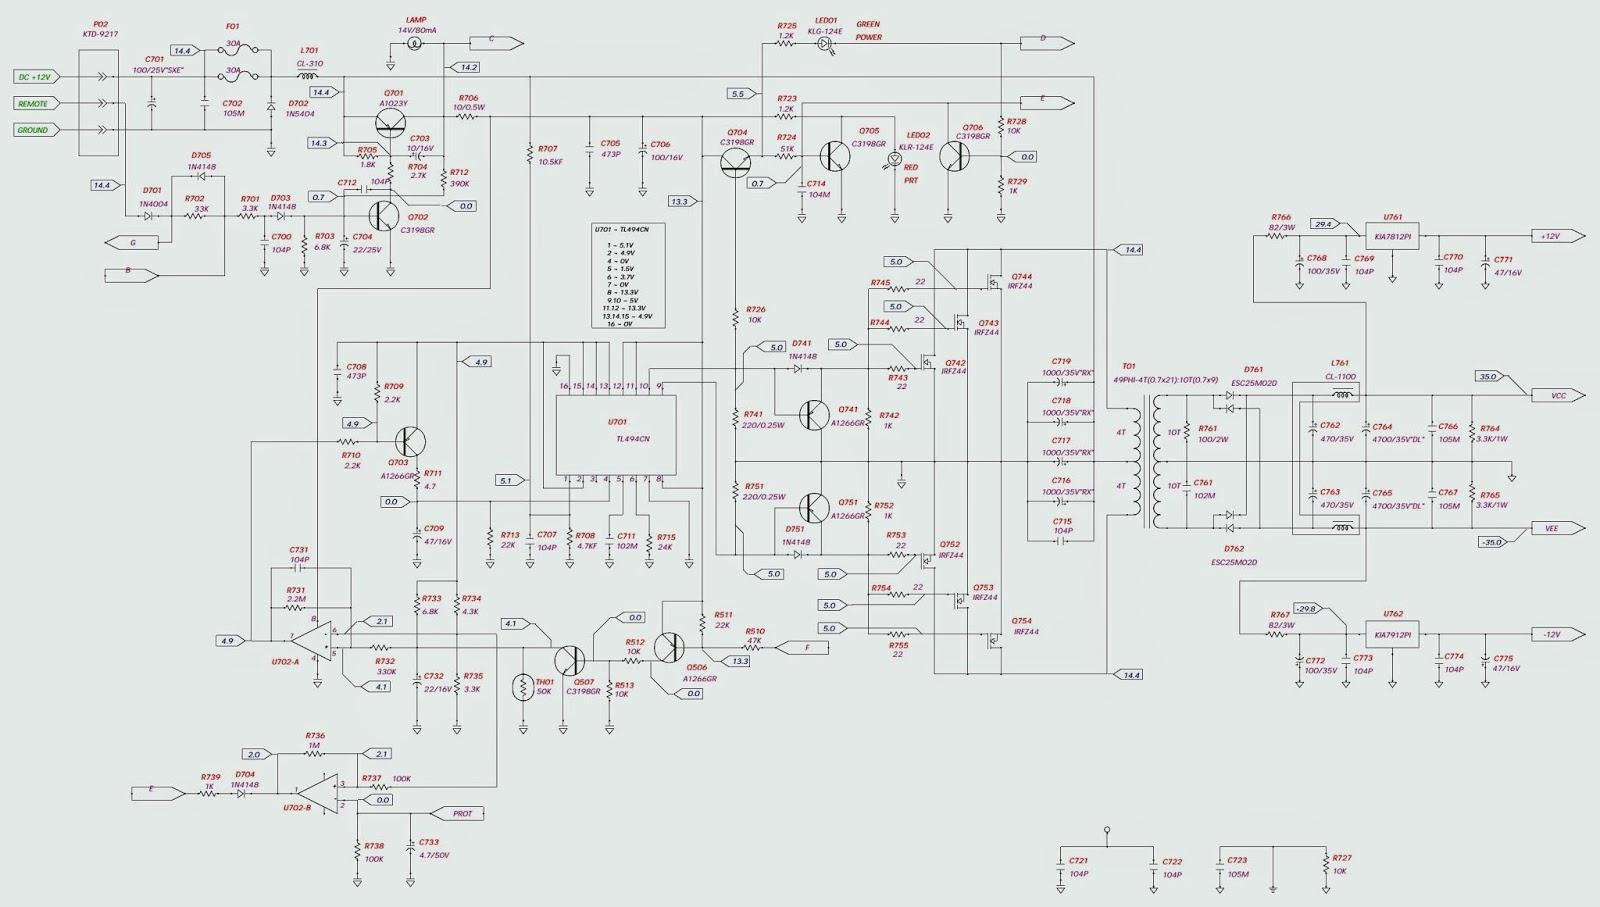 bp600 1 jbl schematic circuit diagram wiring. Black Bedroom Furniture Sets. Home Design Ideas